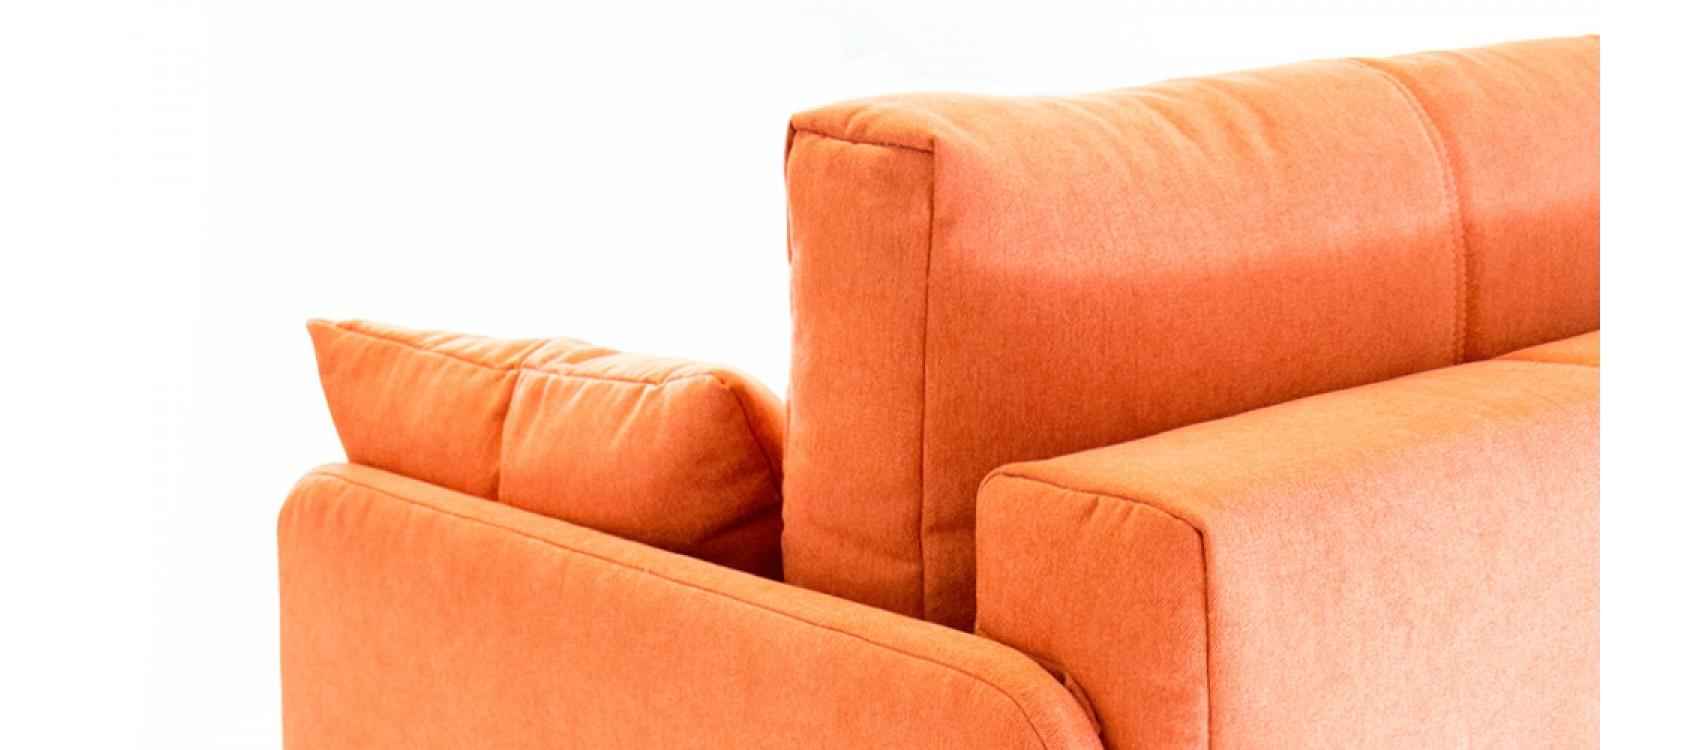 Sofa JOY foto 7